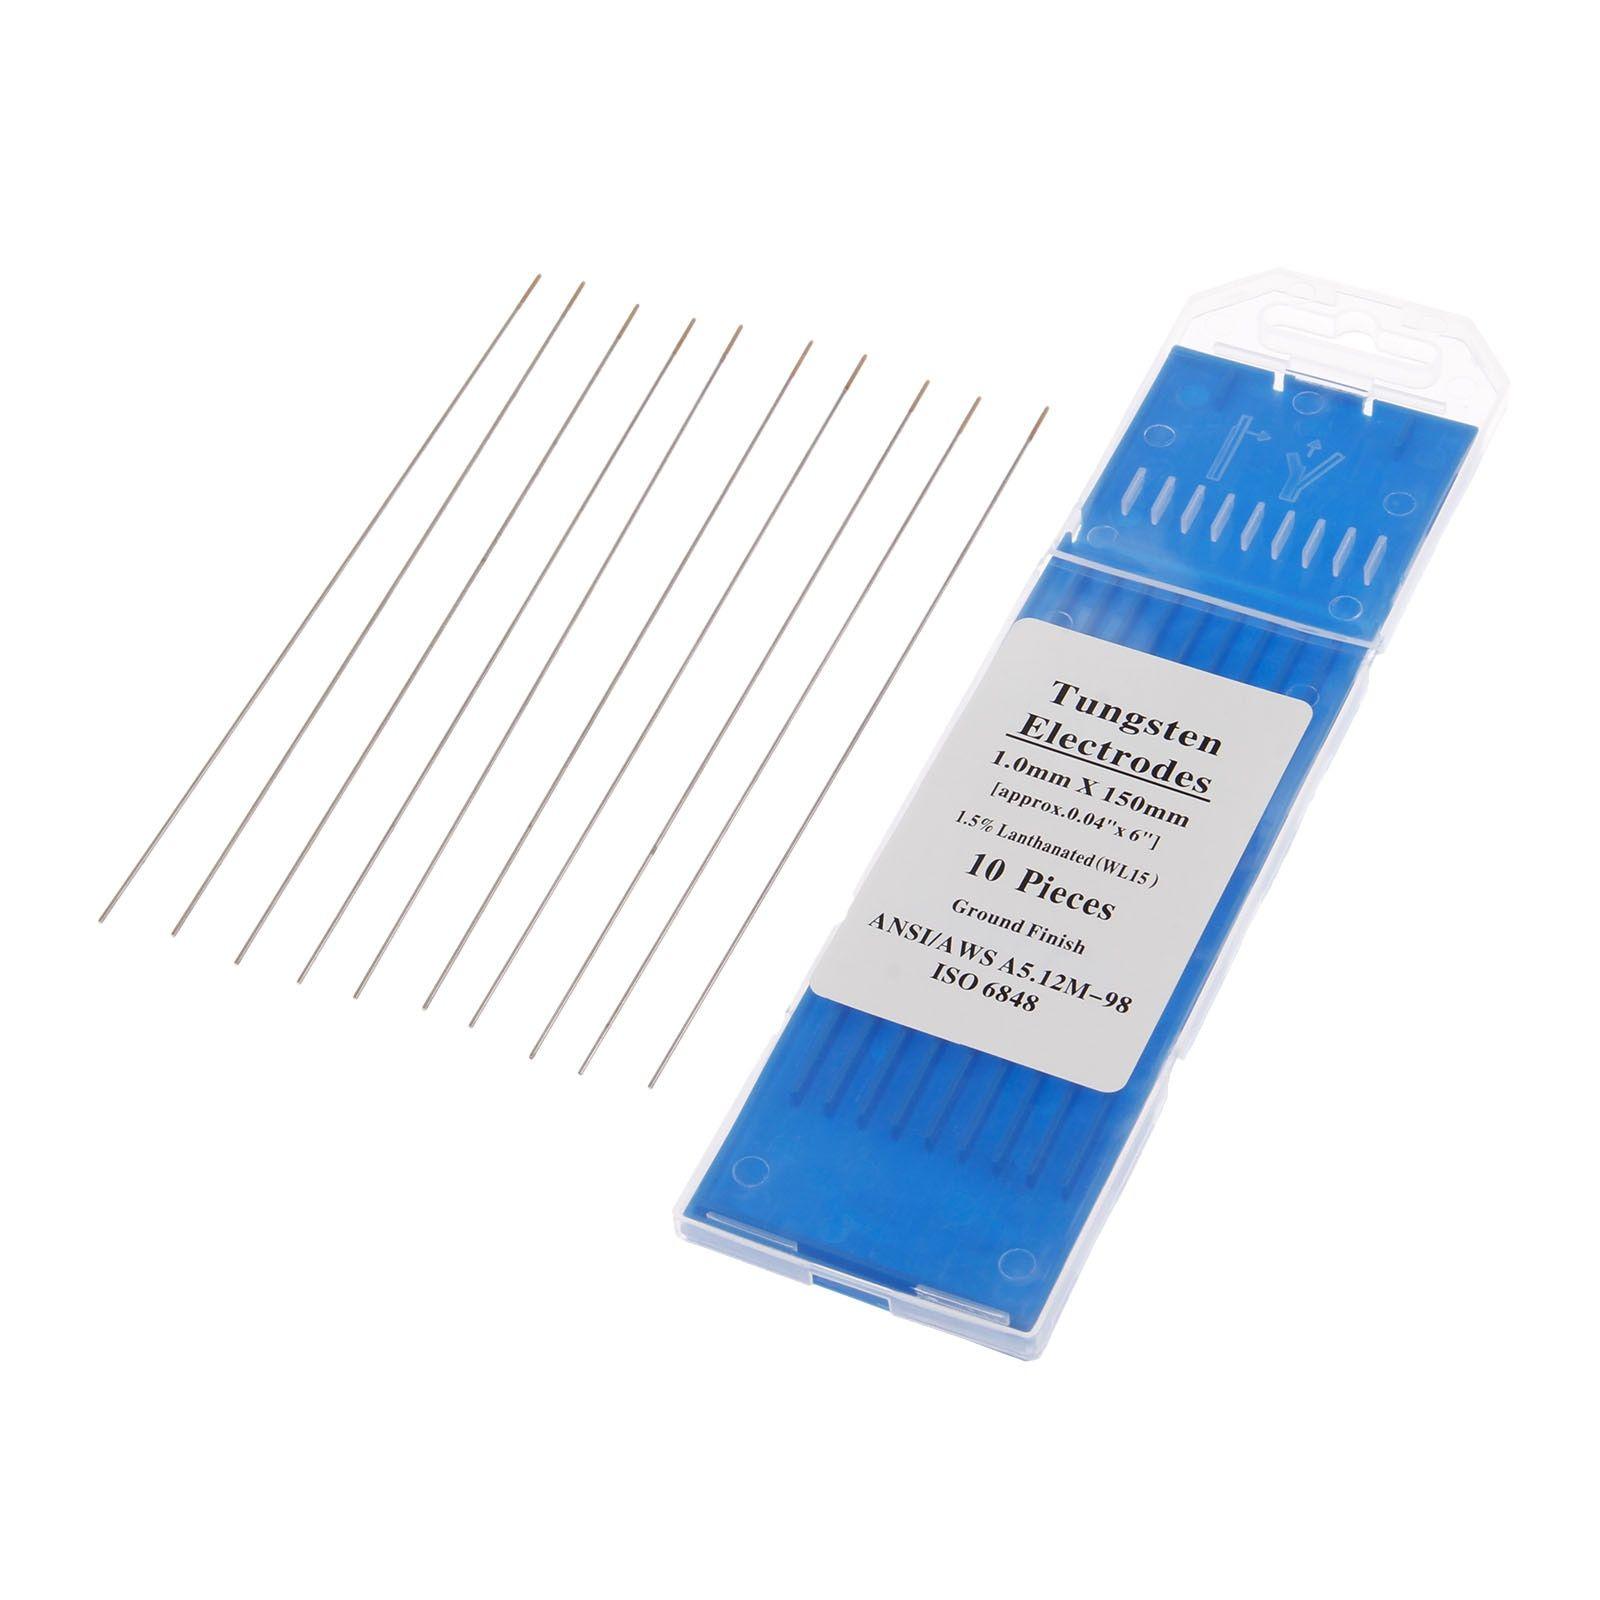 Welding electrodes Aluminum TIG Machine Ceriated tungsten Welding 10pcs